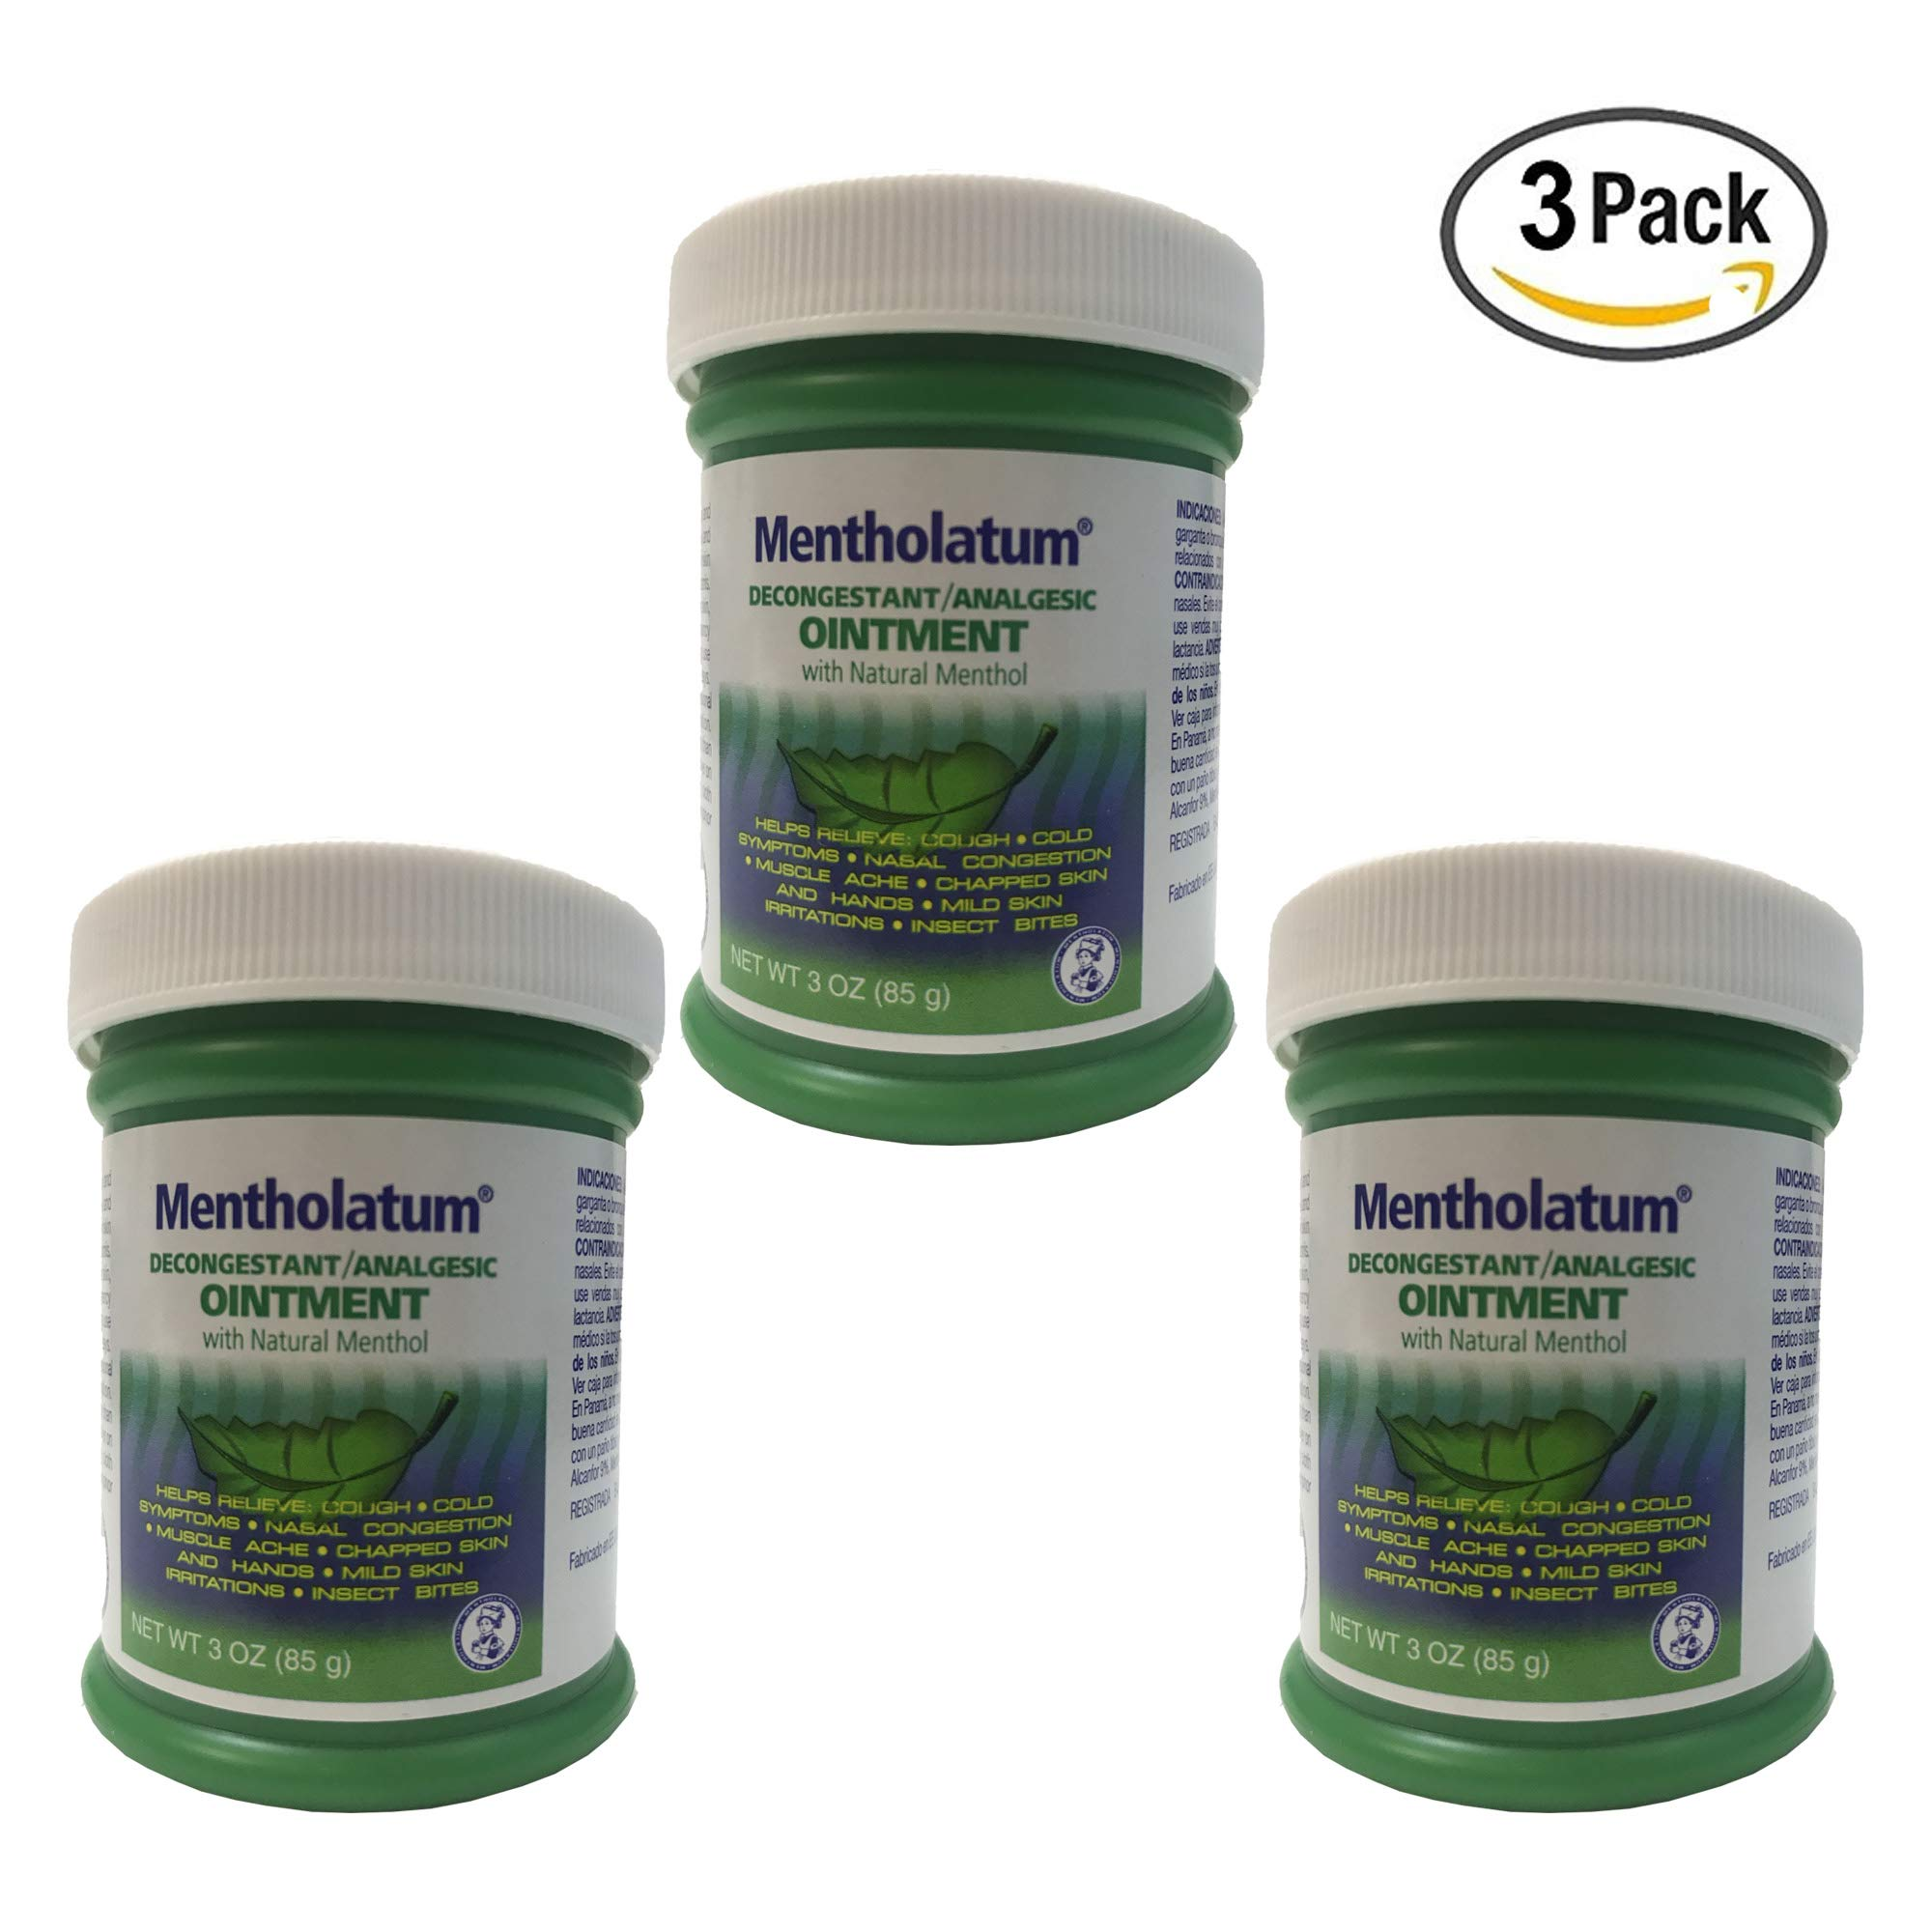 Mentholatum Decongestant/Analgesic Ointment with Natural Menthol 3 Oz (Pack of 3) by Mentholatum